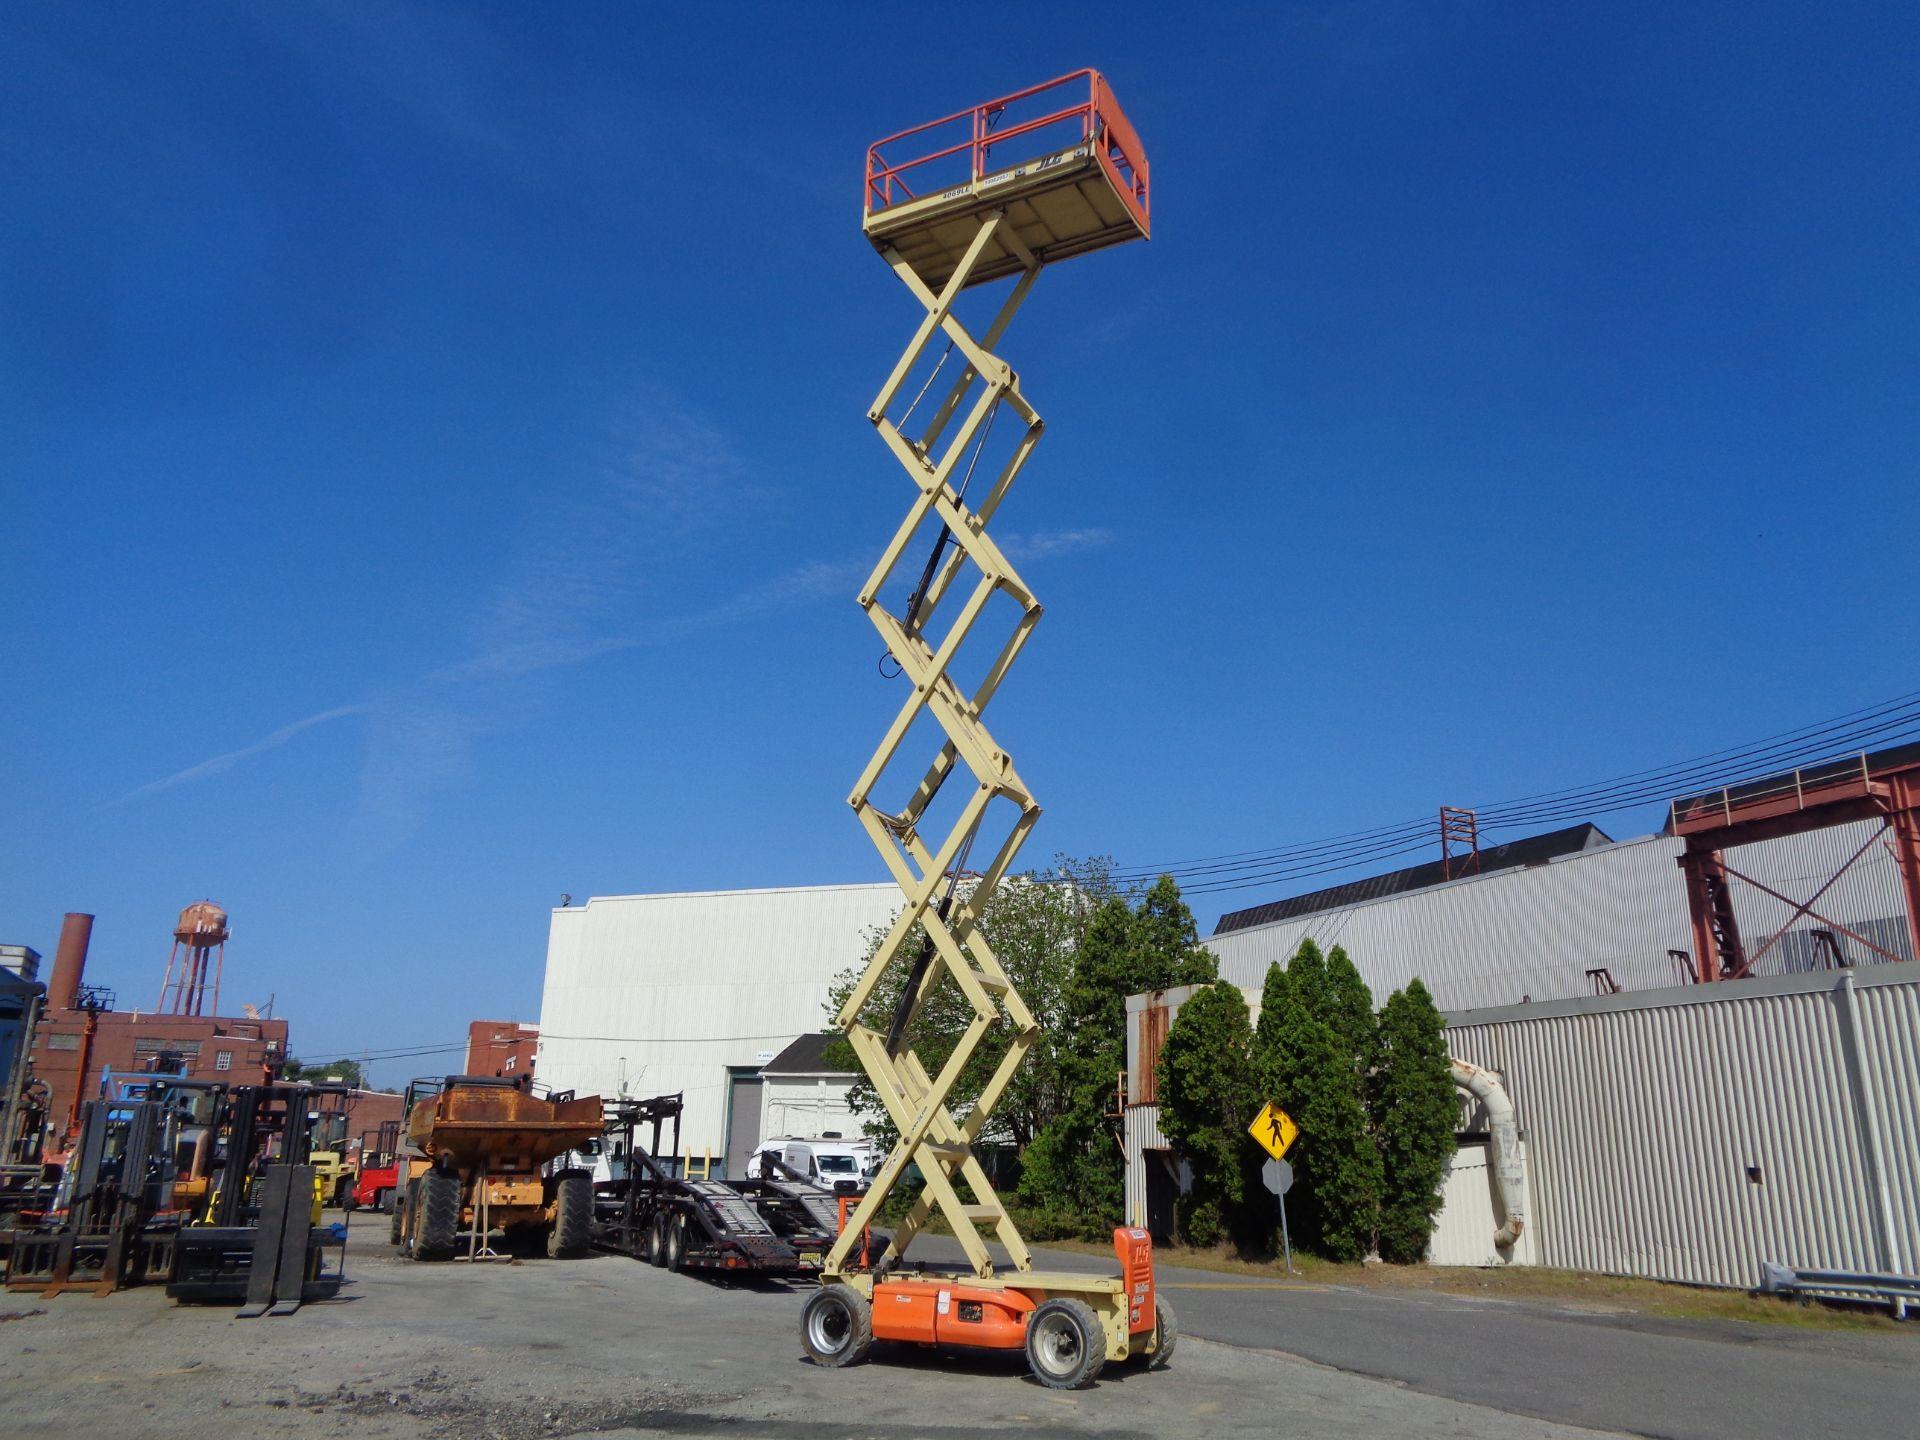 Lot 36 - 2012 JLG 4069LE 40 ft Electric Scissor Lift